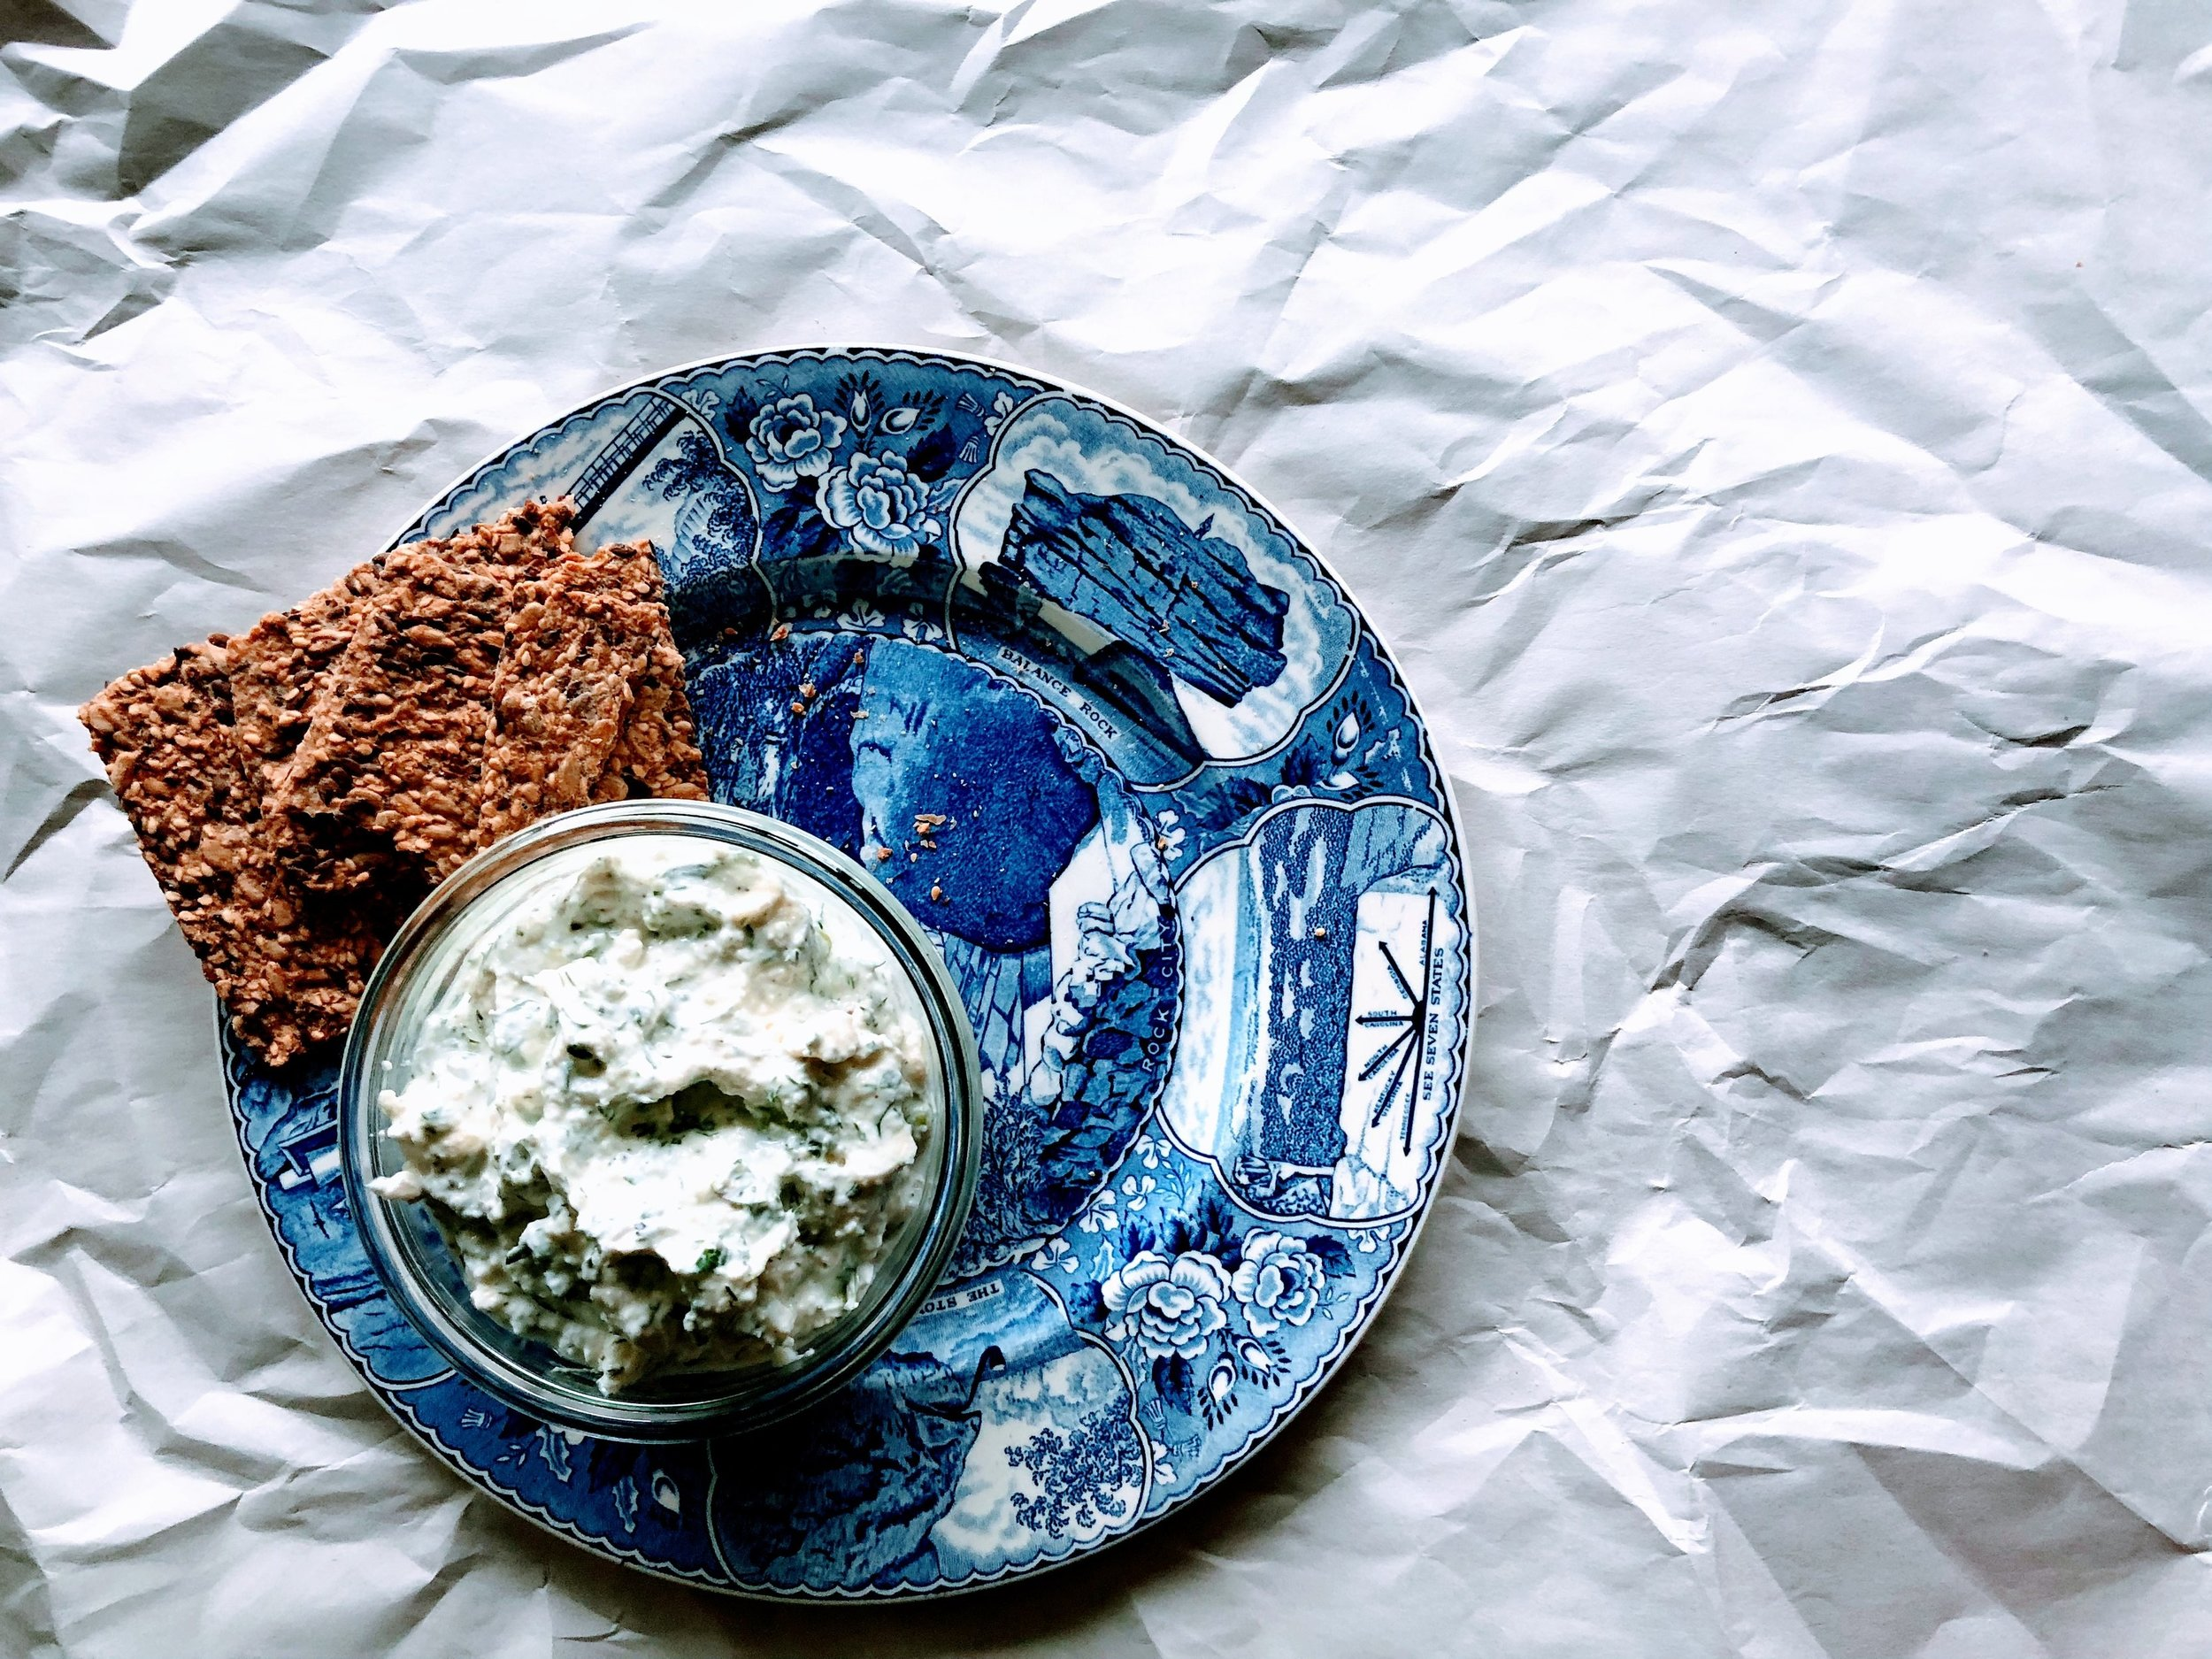 Shallot + Herb Yogurt Spread